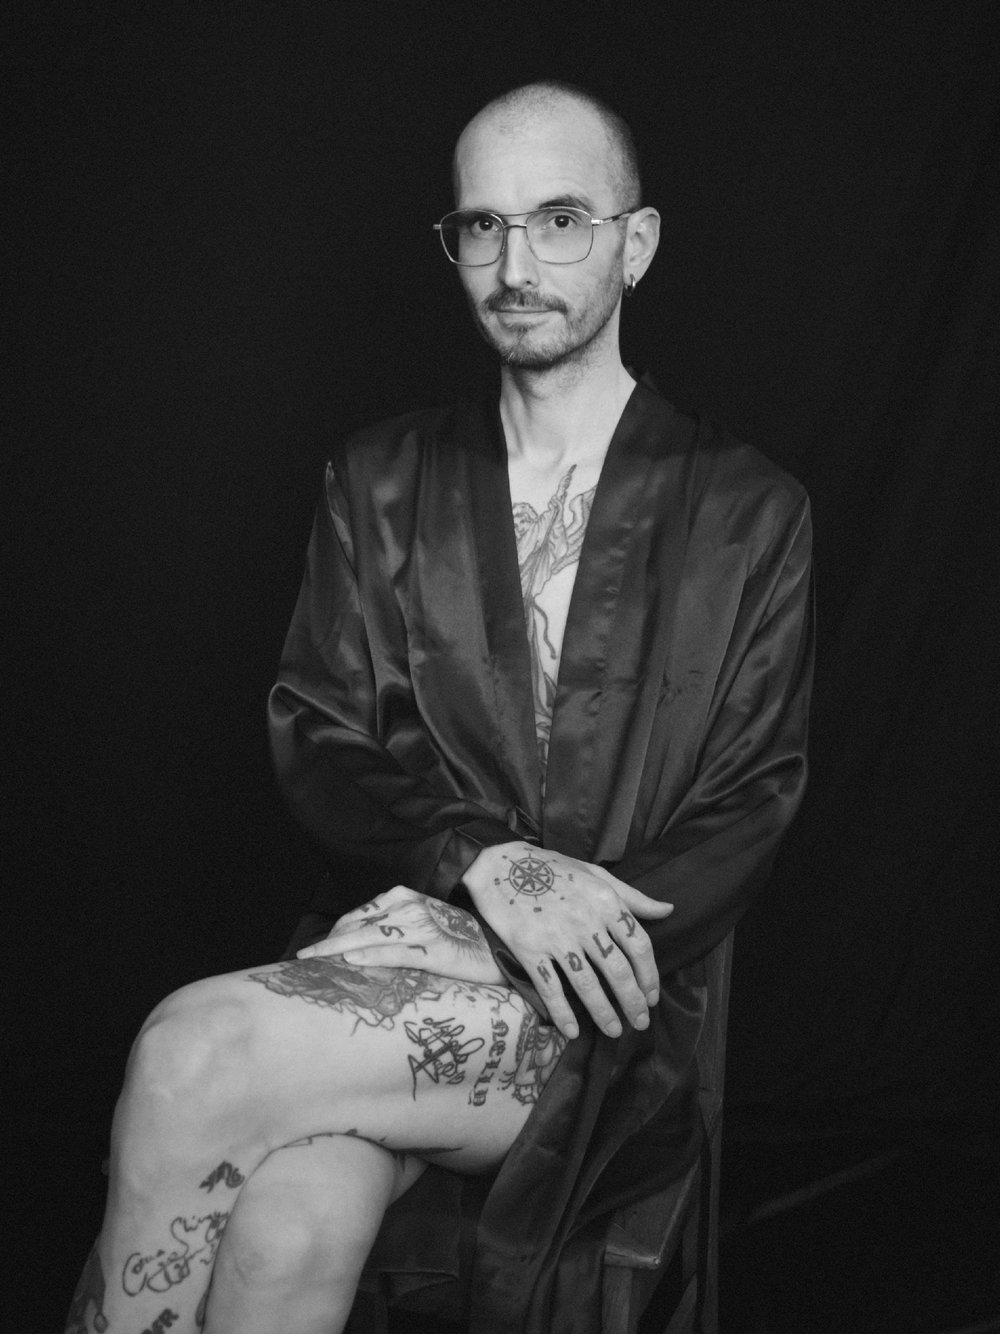 P1033100_Exp_Mark Benecke Portraits.jpg